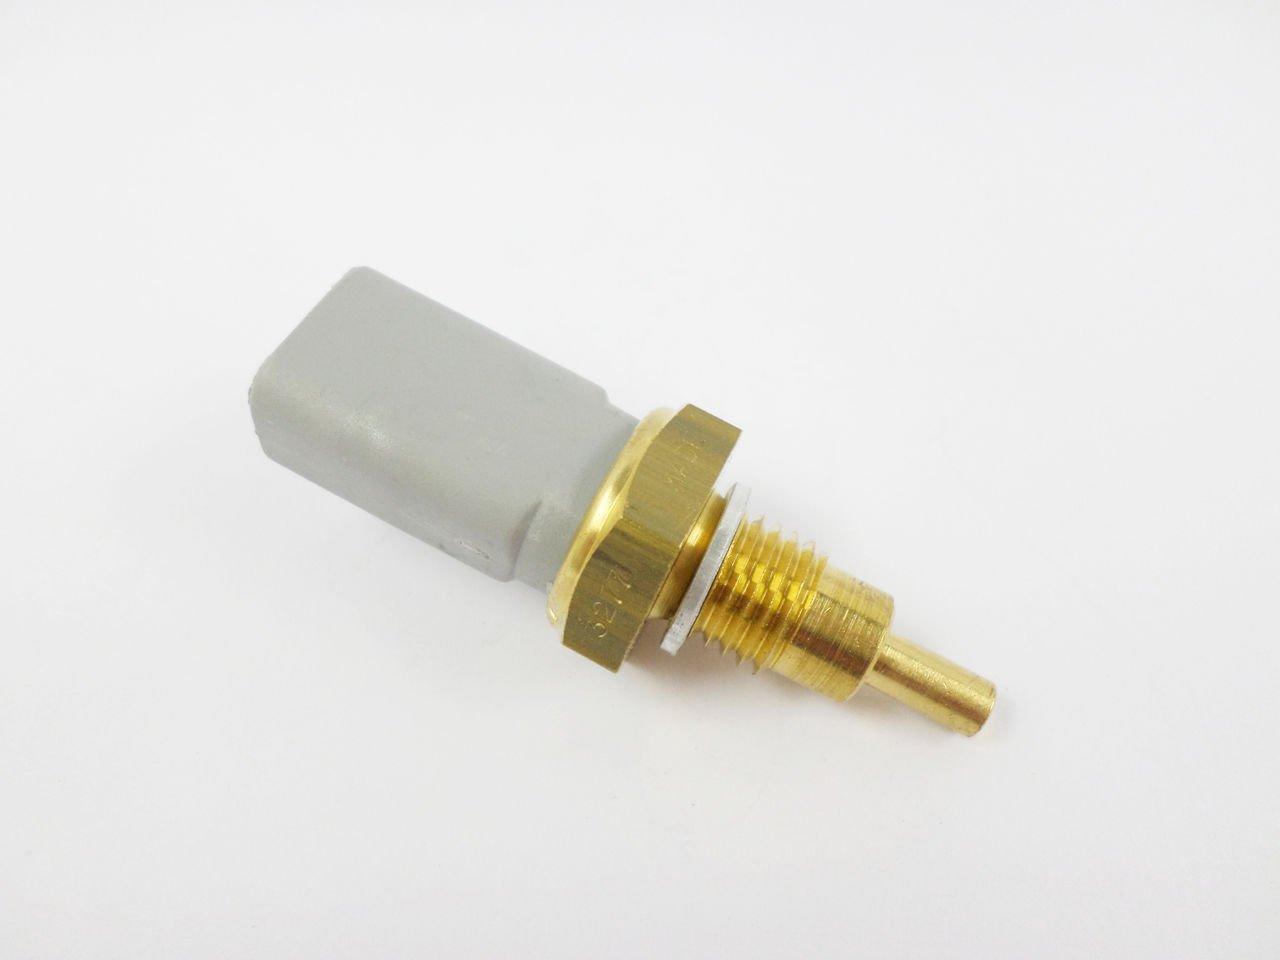 Facet 7.3277 Sensore Temperatura refrigerante Temperatura refrigerante; Sensore Temperatura refrigerante; Sensore